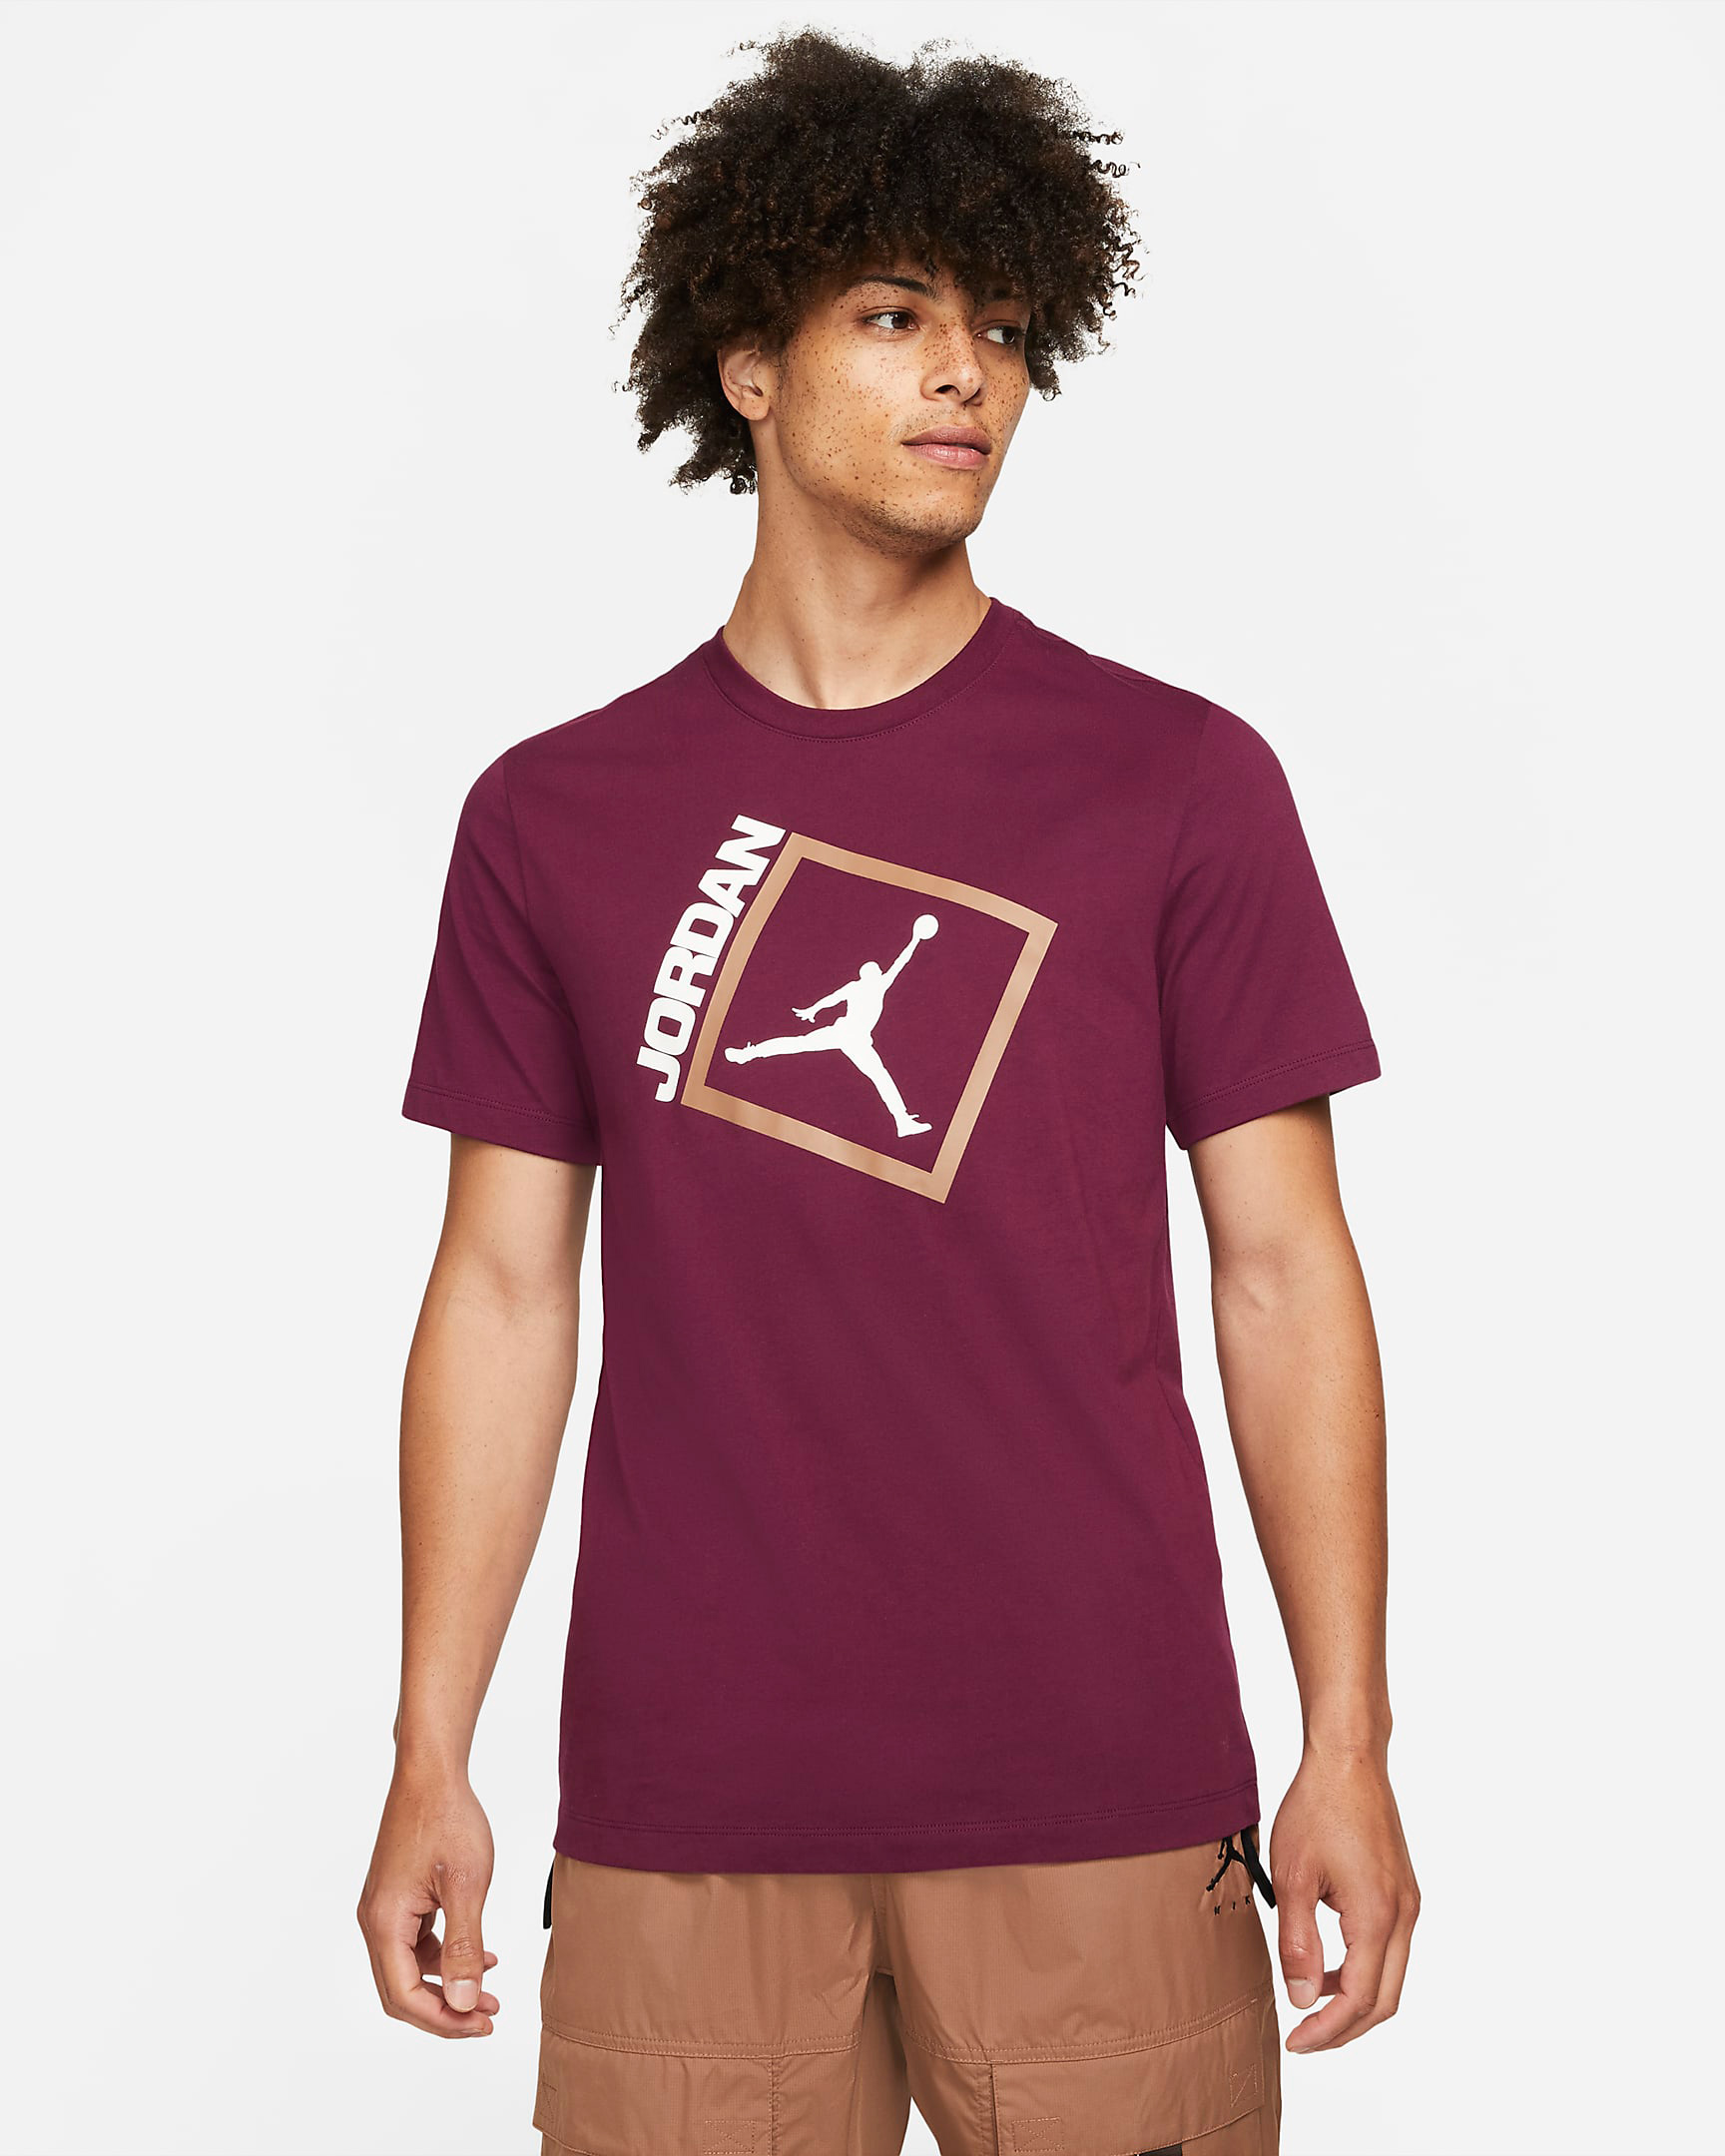 jordan-6-bordeaux-matching-shirt